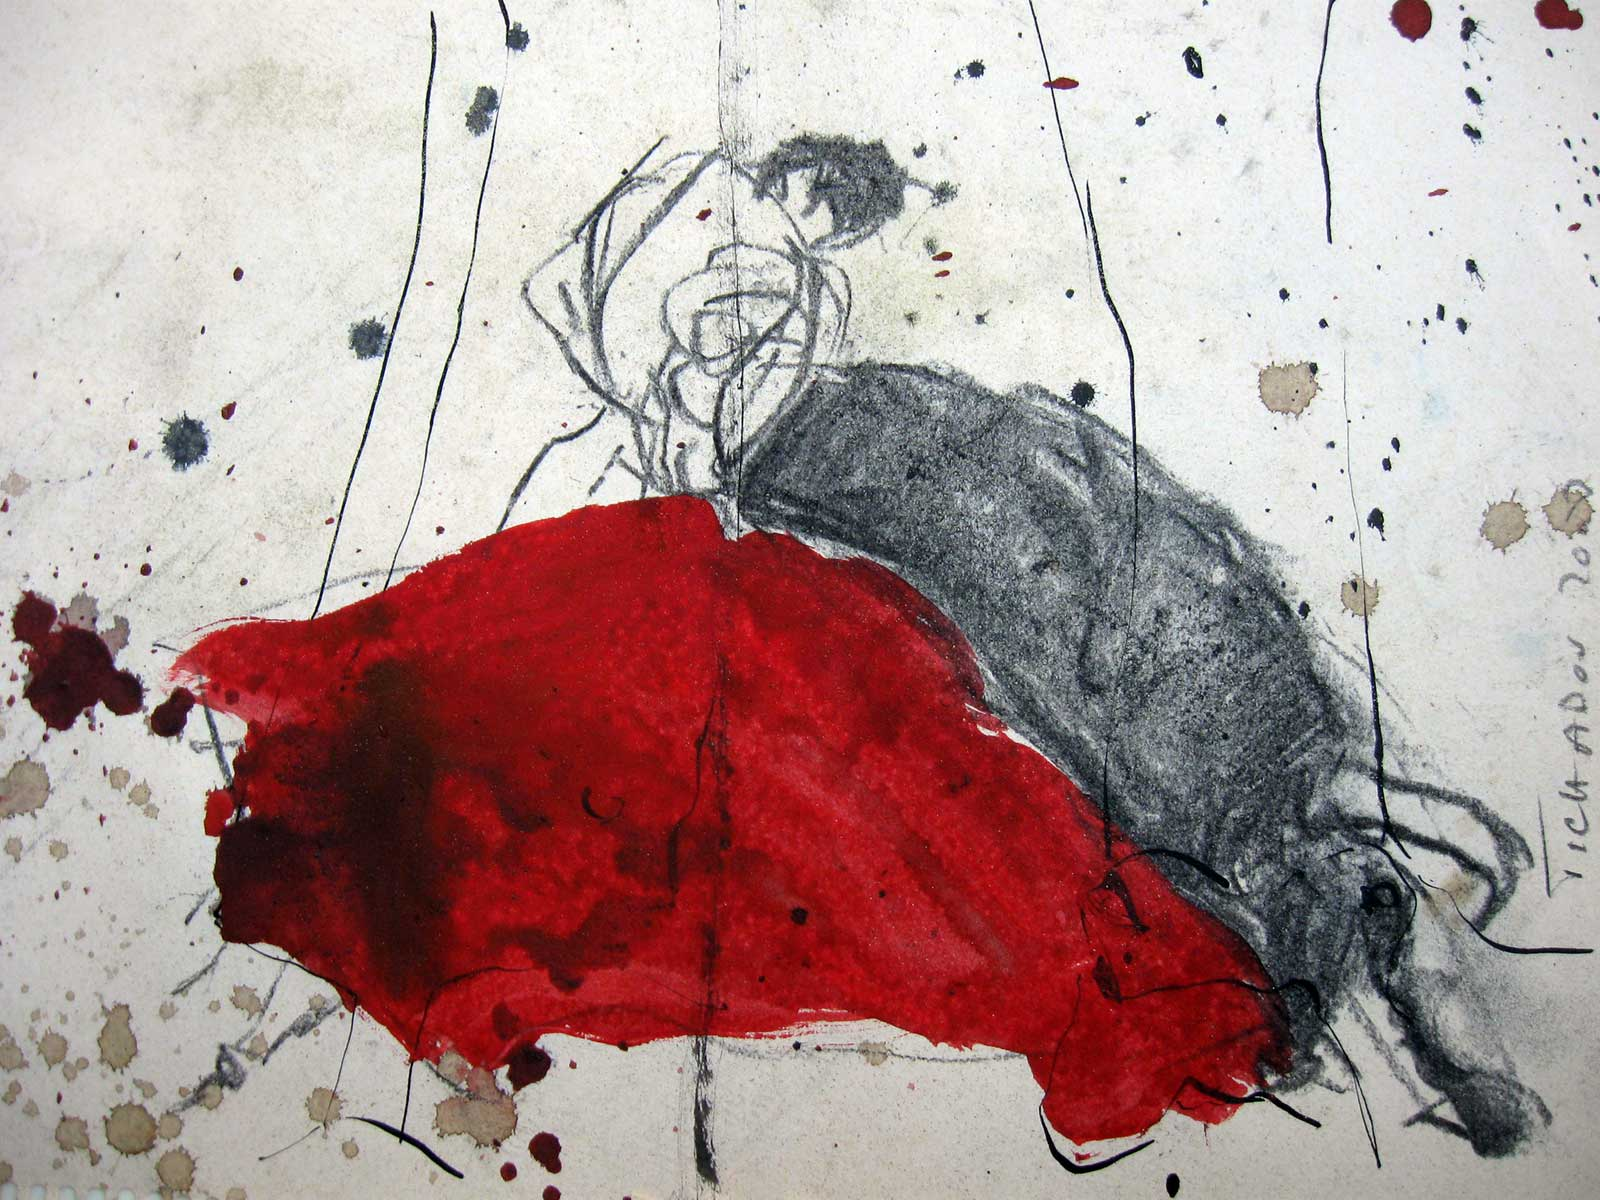 tauromachie Corinne Tichadou artiste peintre Bézier tableaux peinture art contemporain